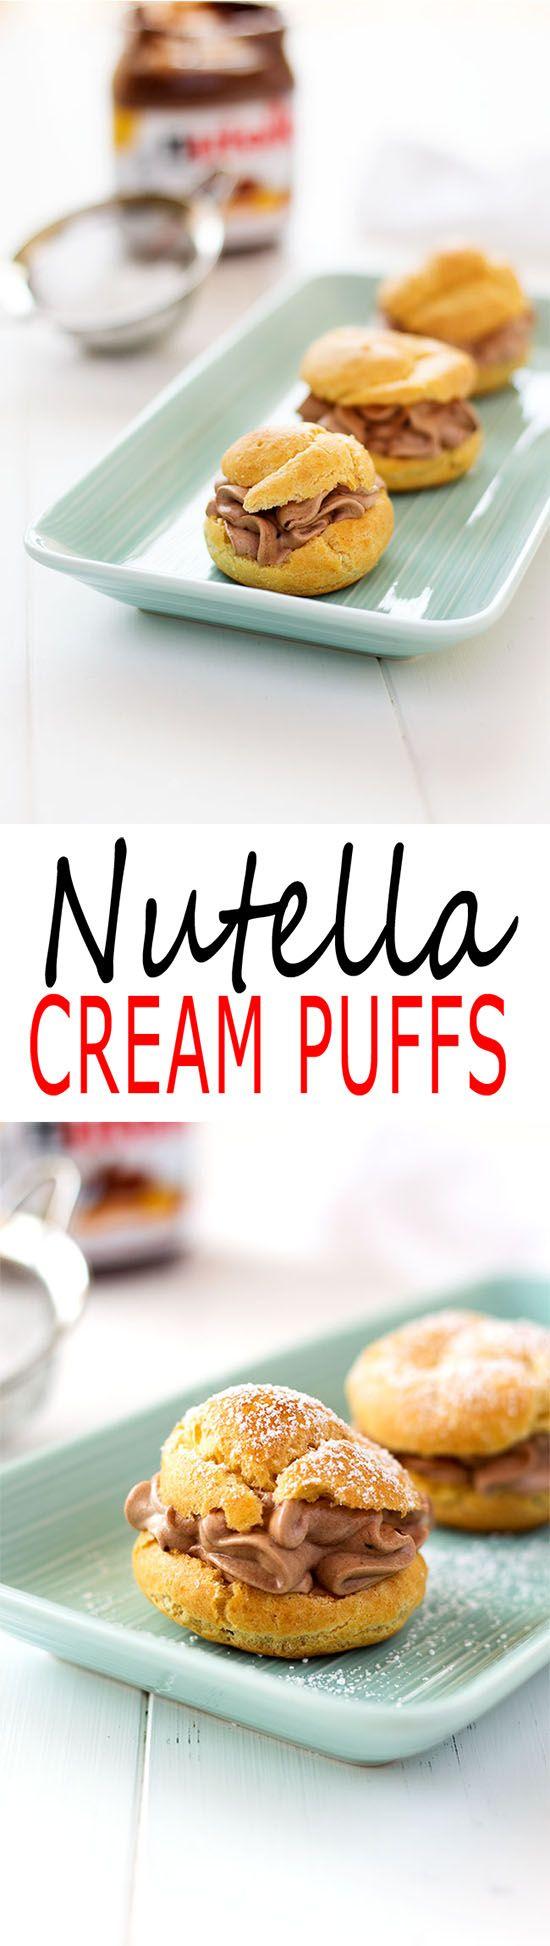 Nutella Cream Puffs: crisp choux pastry shells filled with heavenly Nutella whipped cream. Easy yet elegant dessert recipe. | Kitchen Gidget